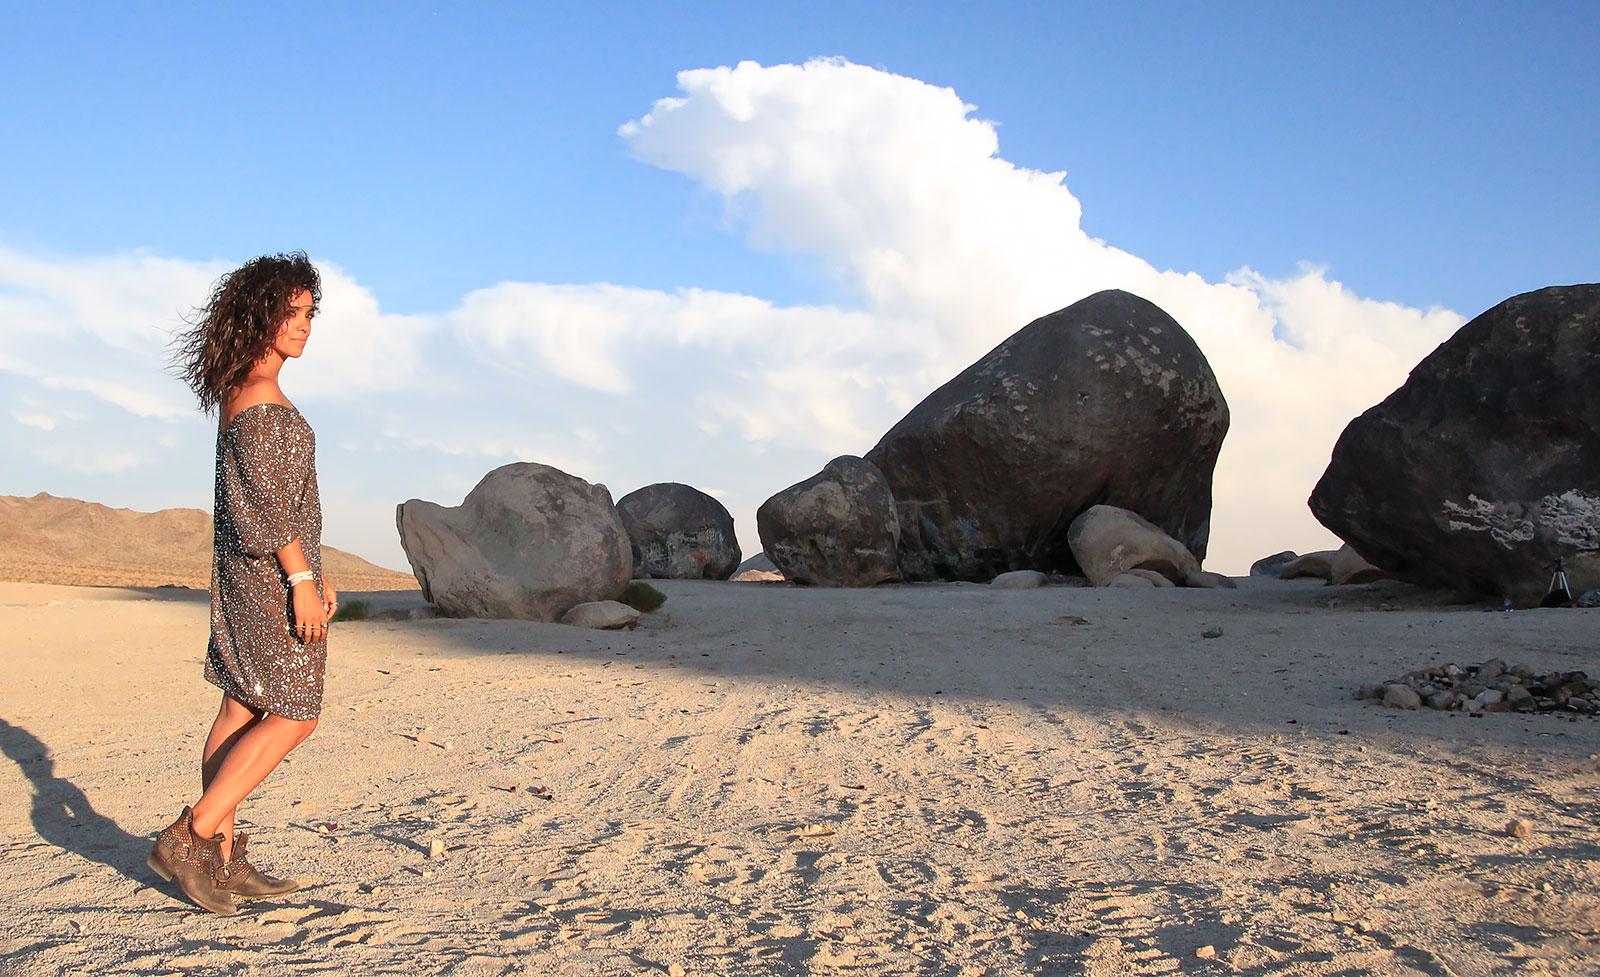 Giant Rock, Landers, CA